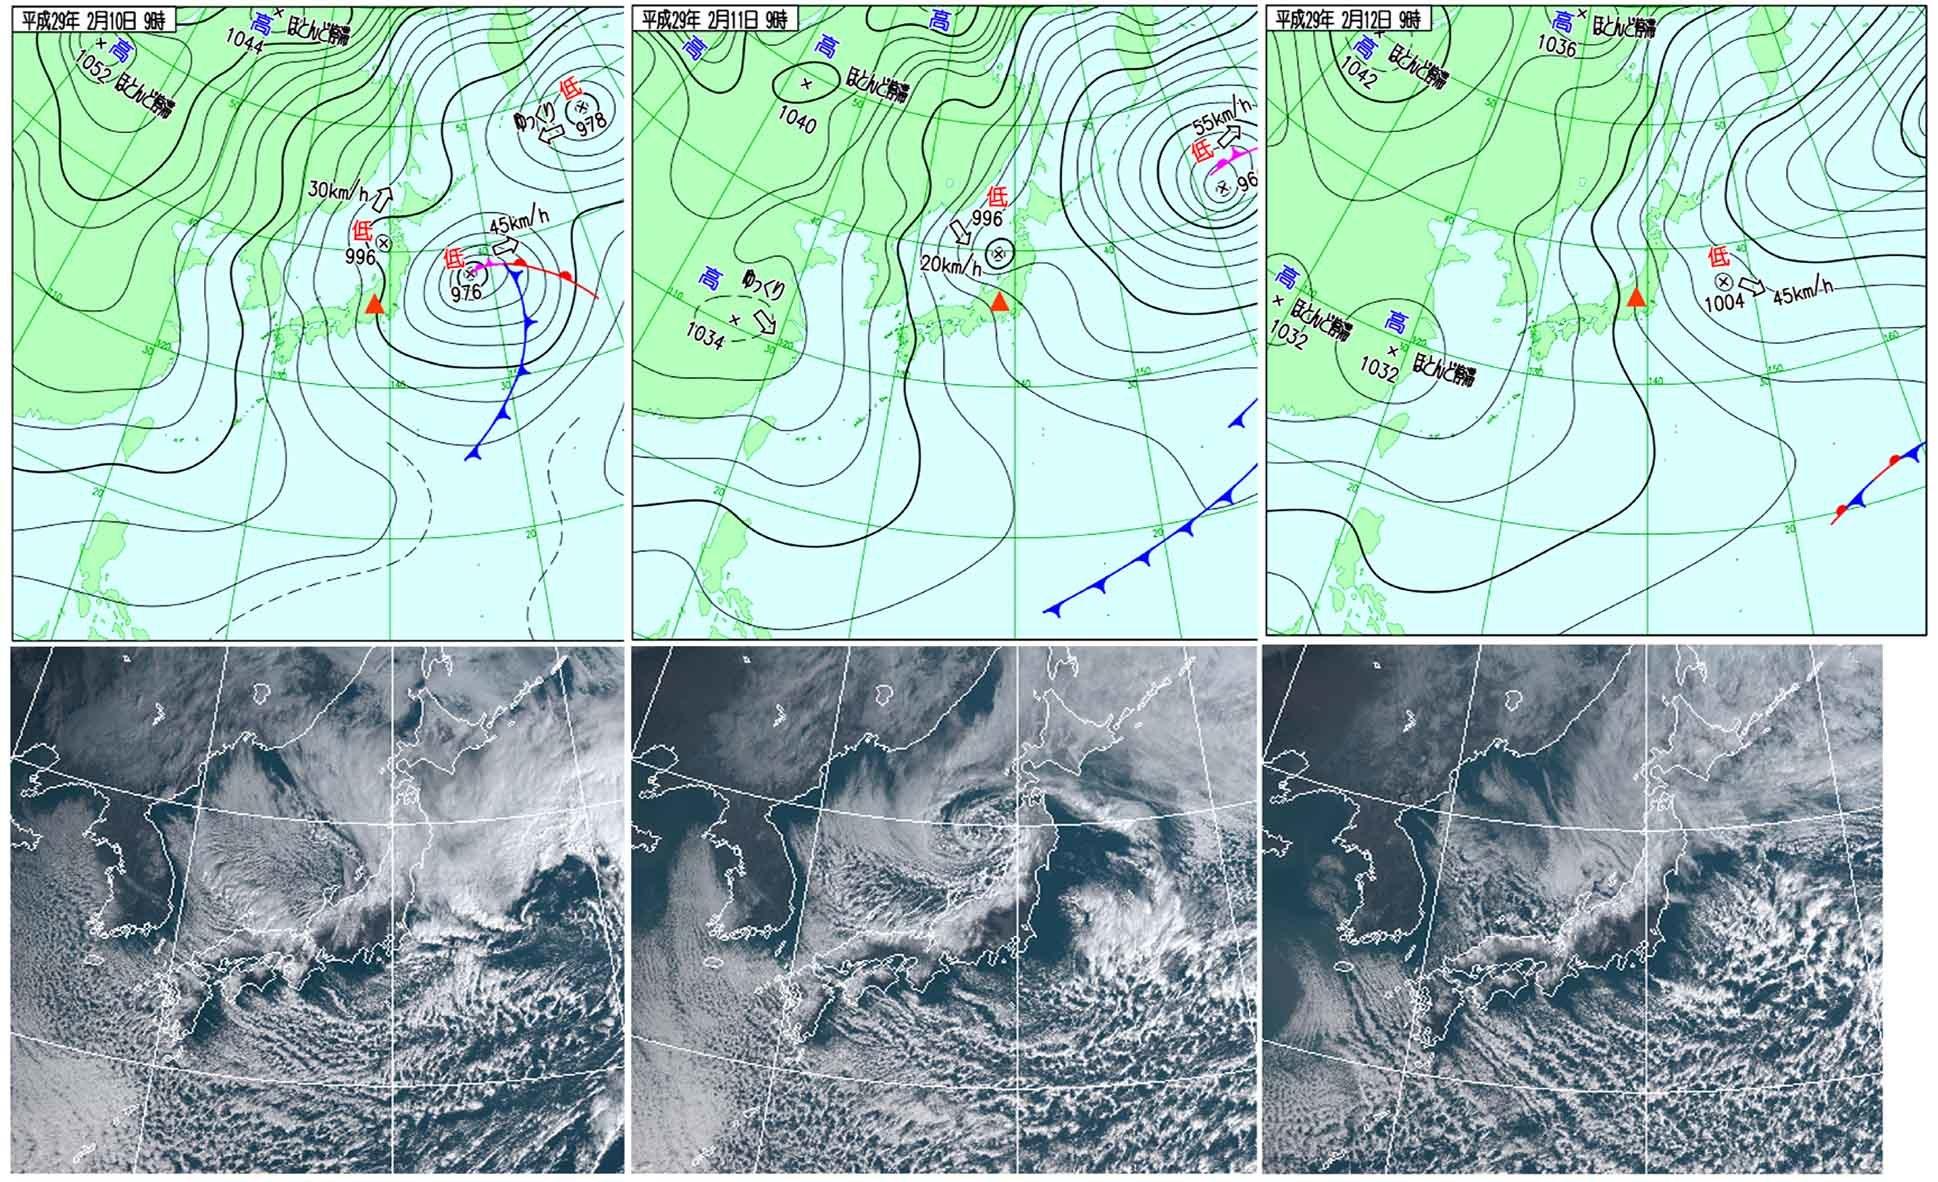 2月10日09時~12日09時 天気図と衛星画像